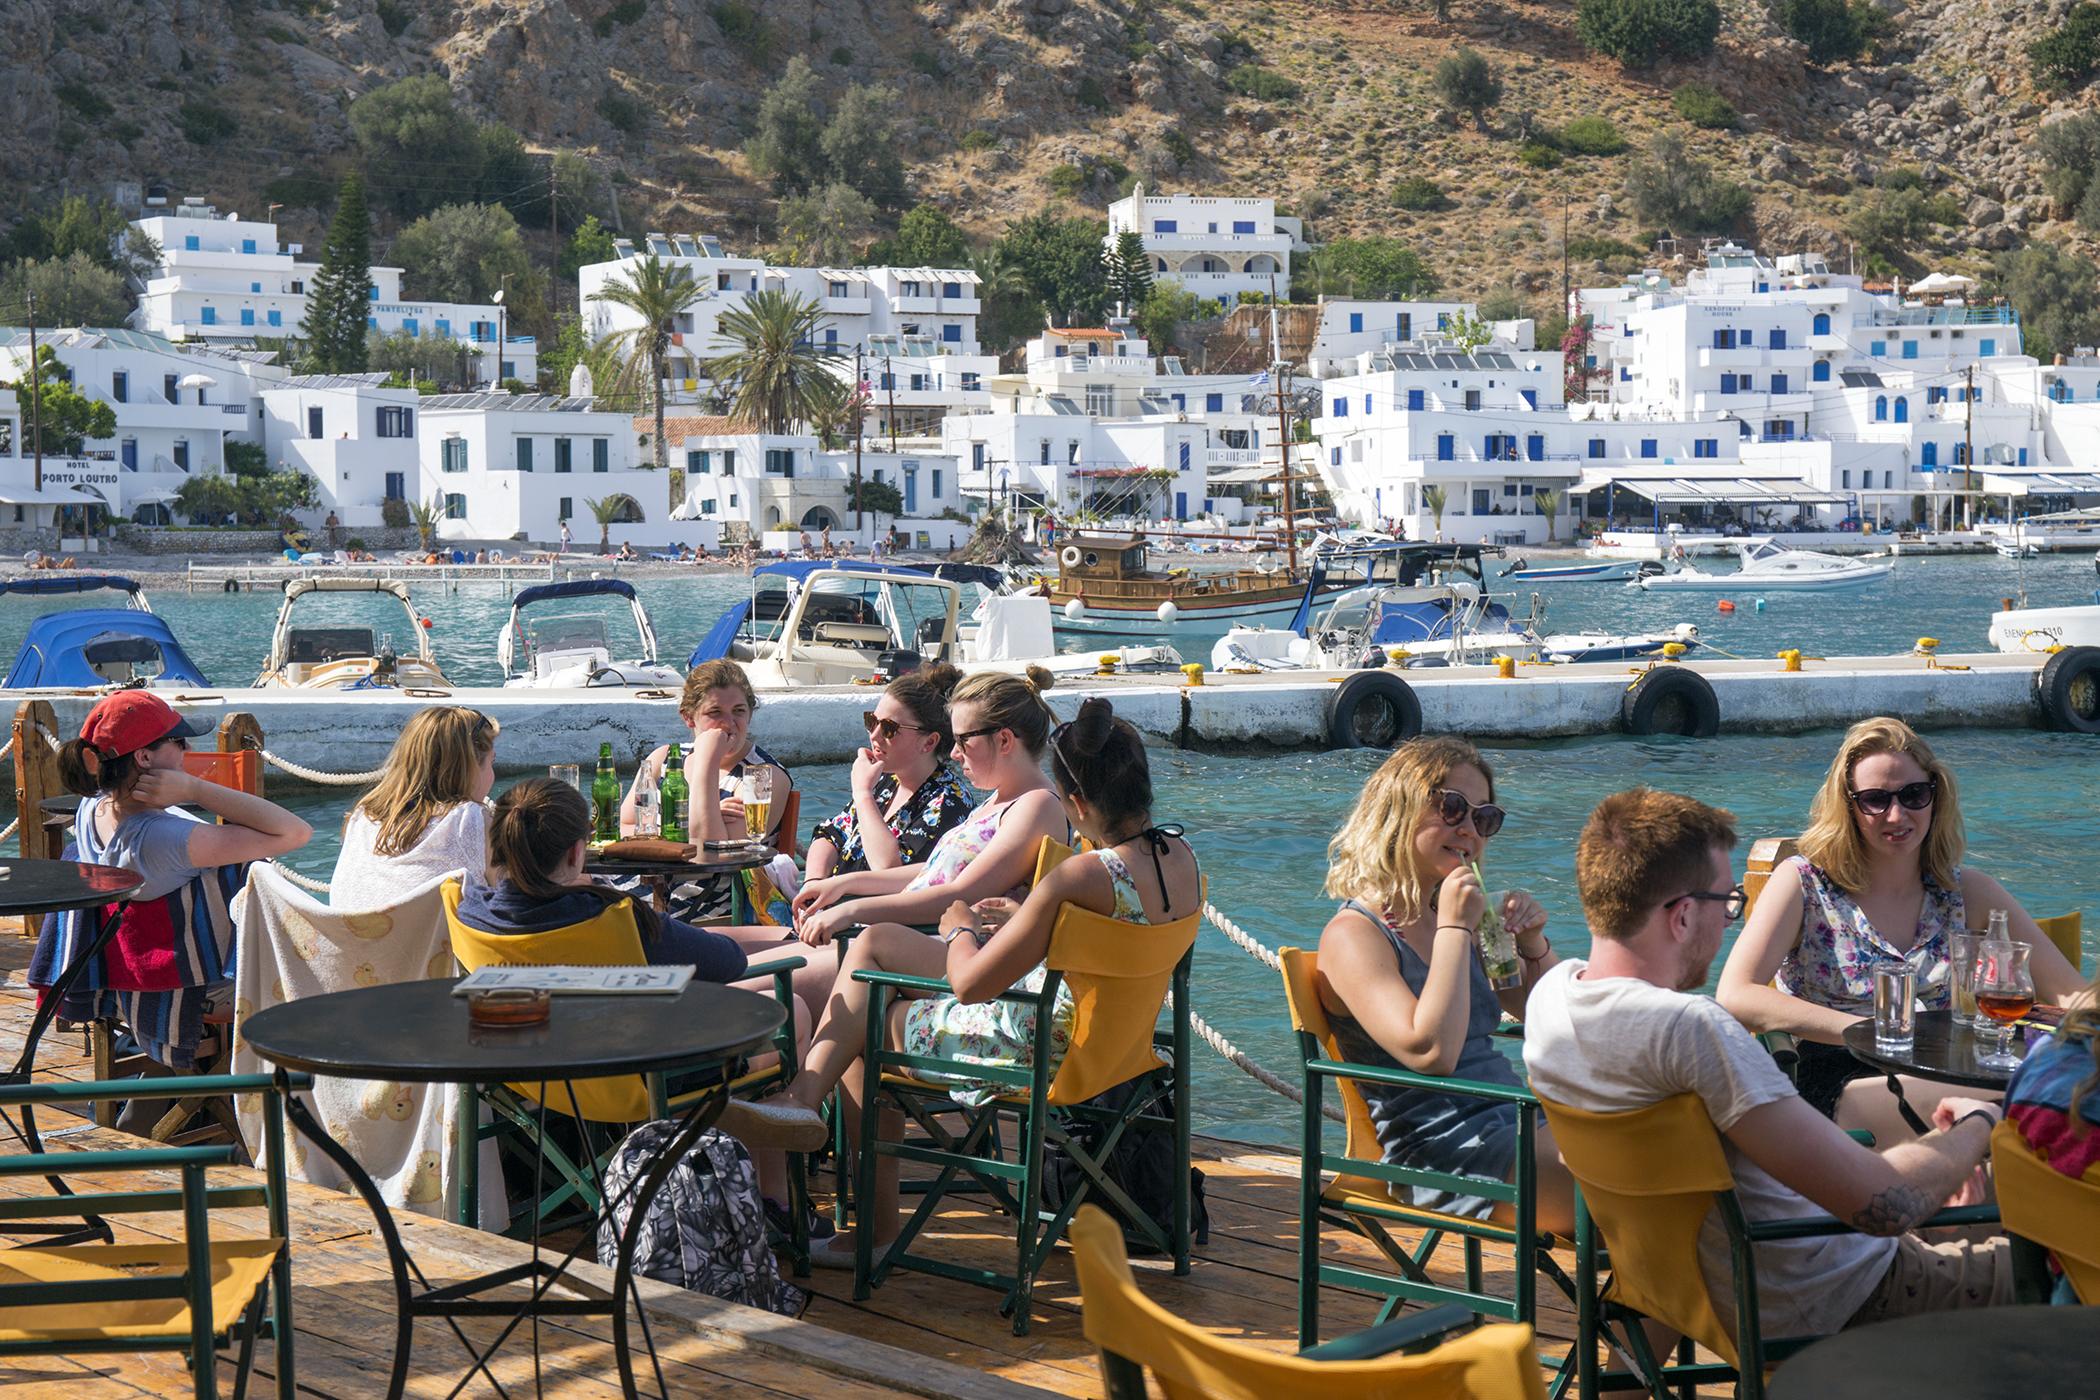 170407-europe-travel-crete